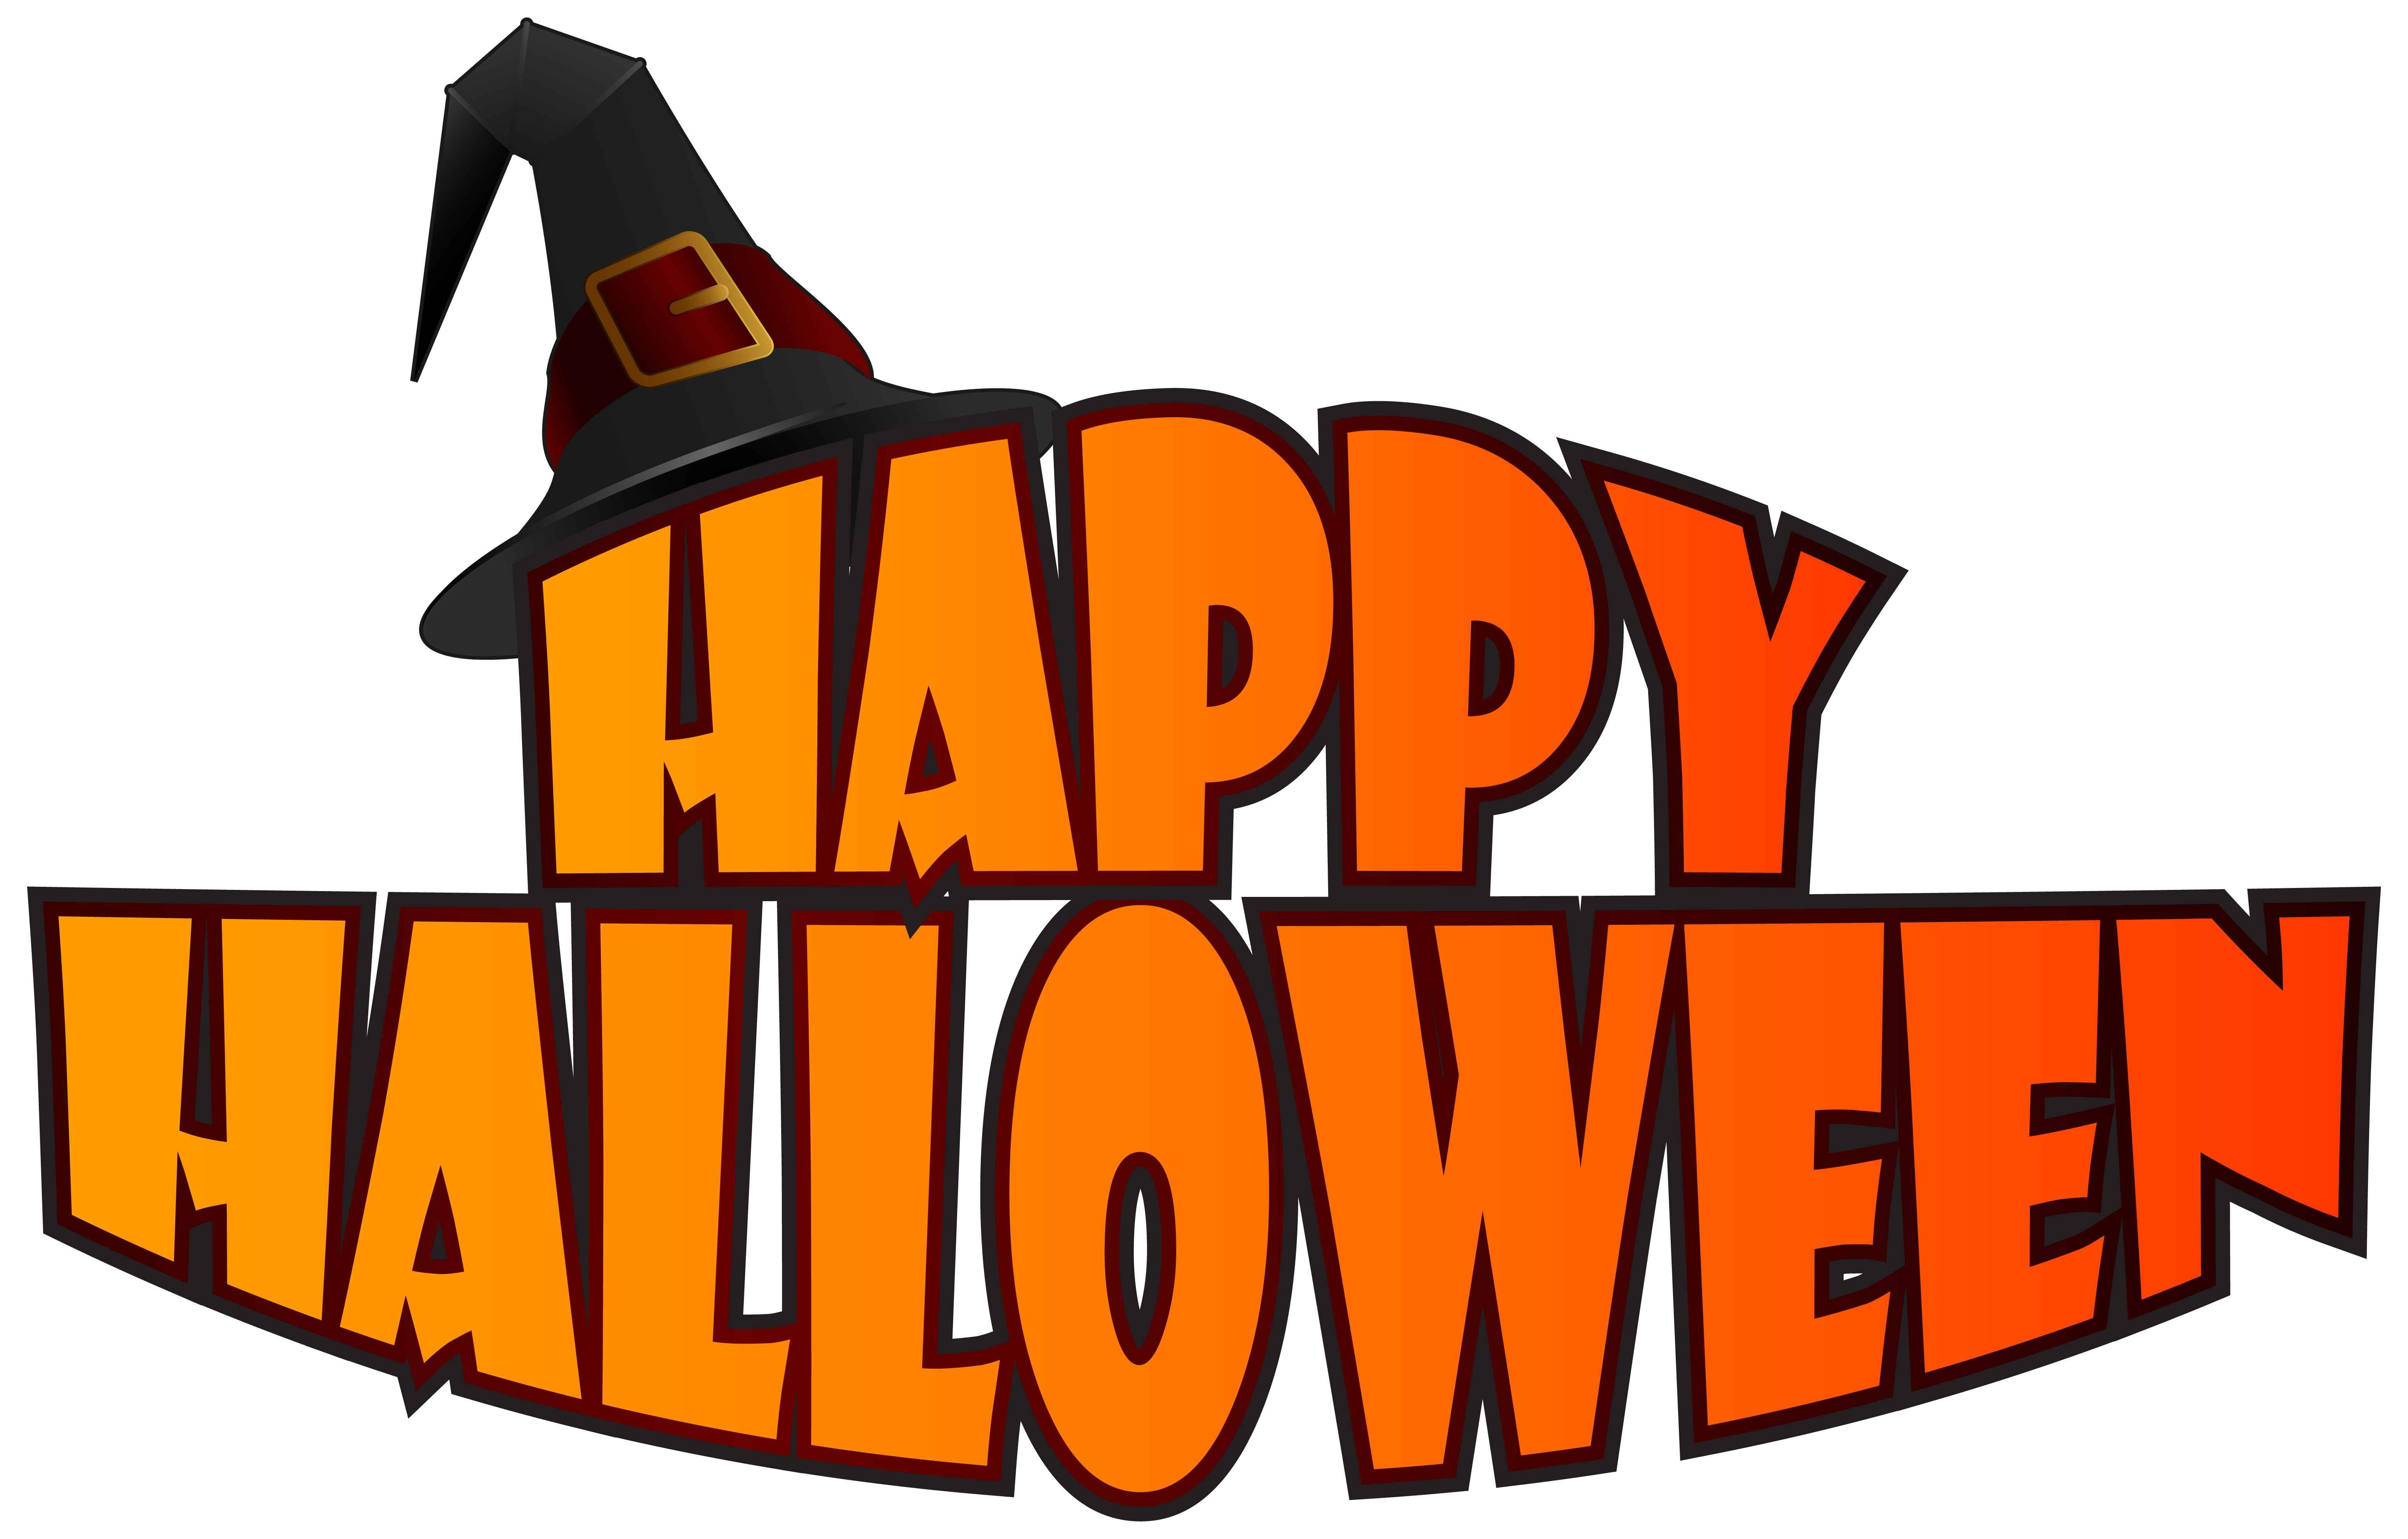 Halloween images of clip art